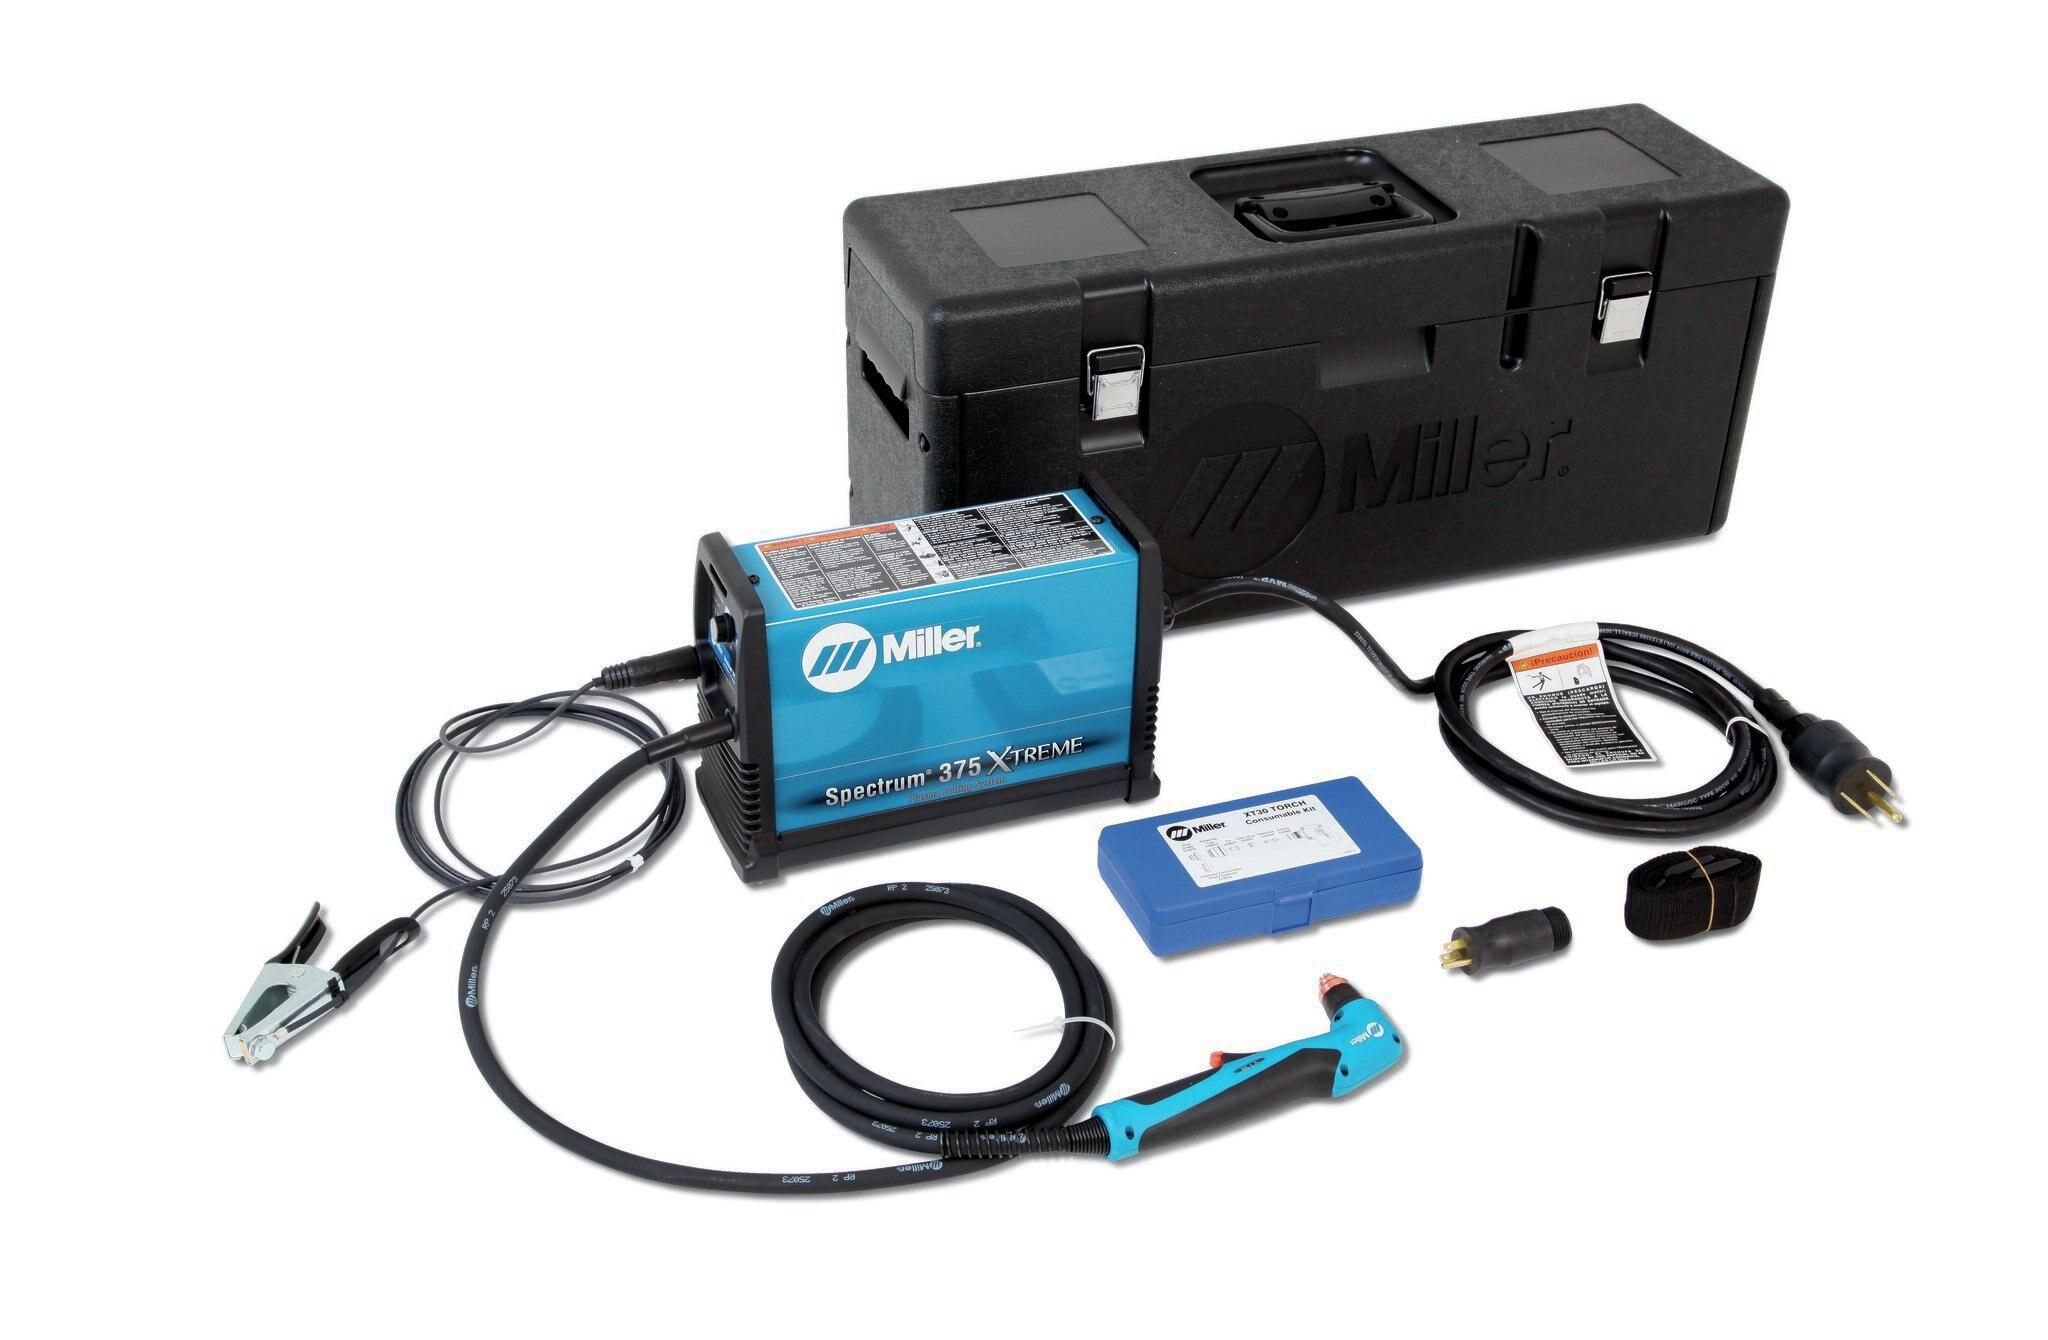 Miller Spectrum 375 >> Miller S Spectrum 375 X Treme Plasma Cutter Tool Of The Month